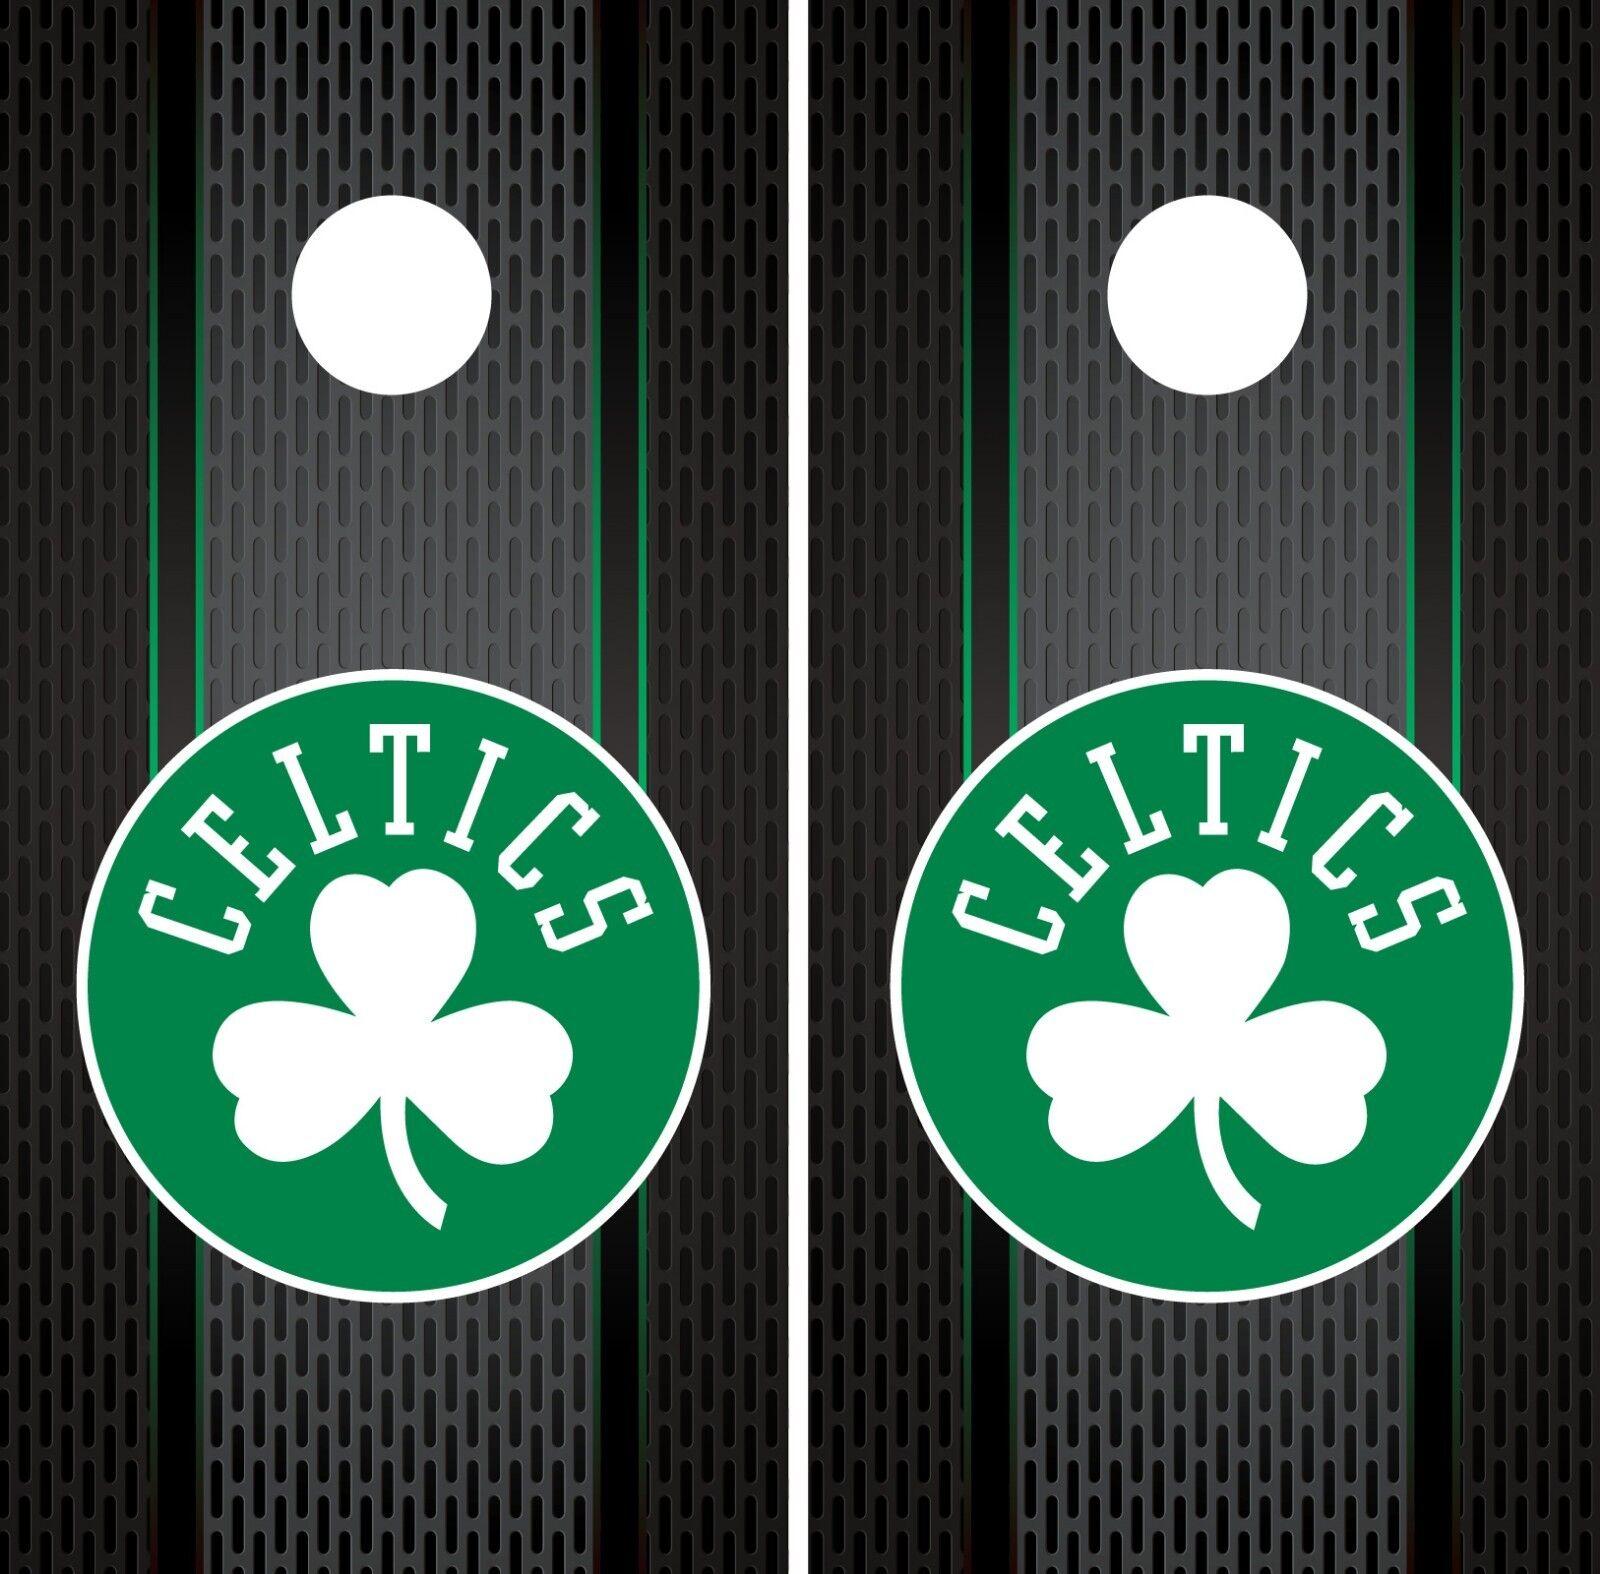 Boston Celtics Cornhole  Wrap NBA Game Board Skin Set Vinyl Decal Art CO561  best prices and freshest styles